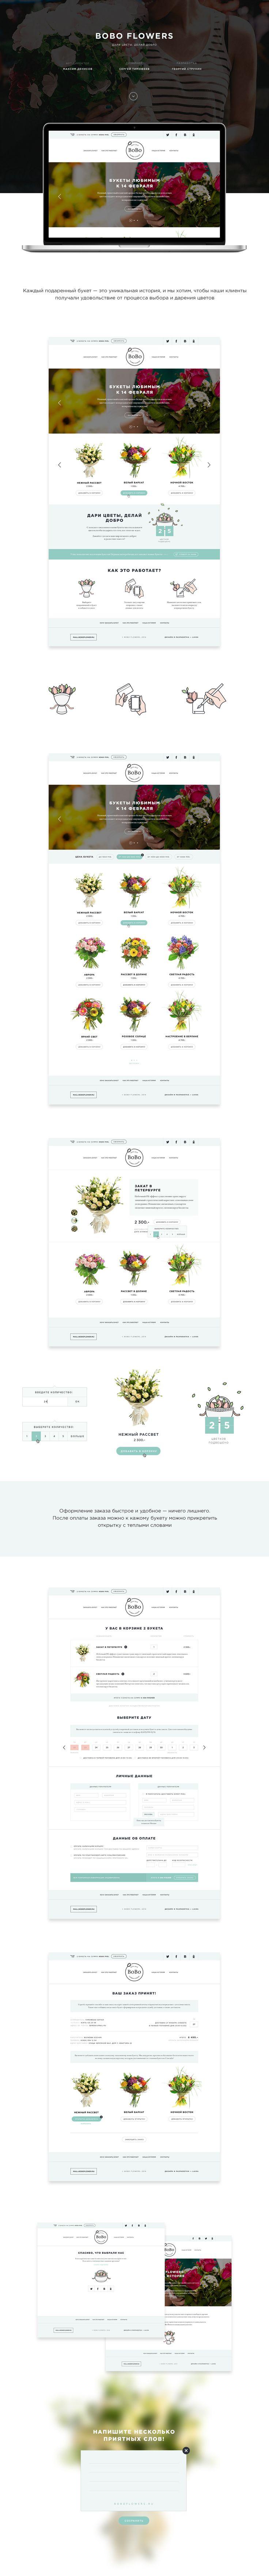 BOBO FLOWER STORIES, Site © СергейТимофеев